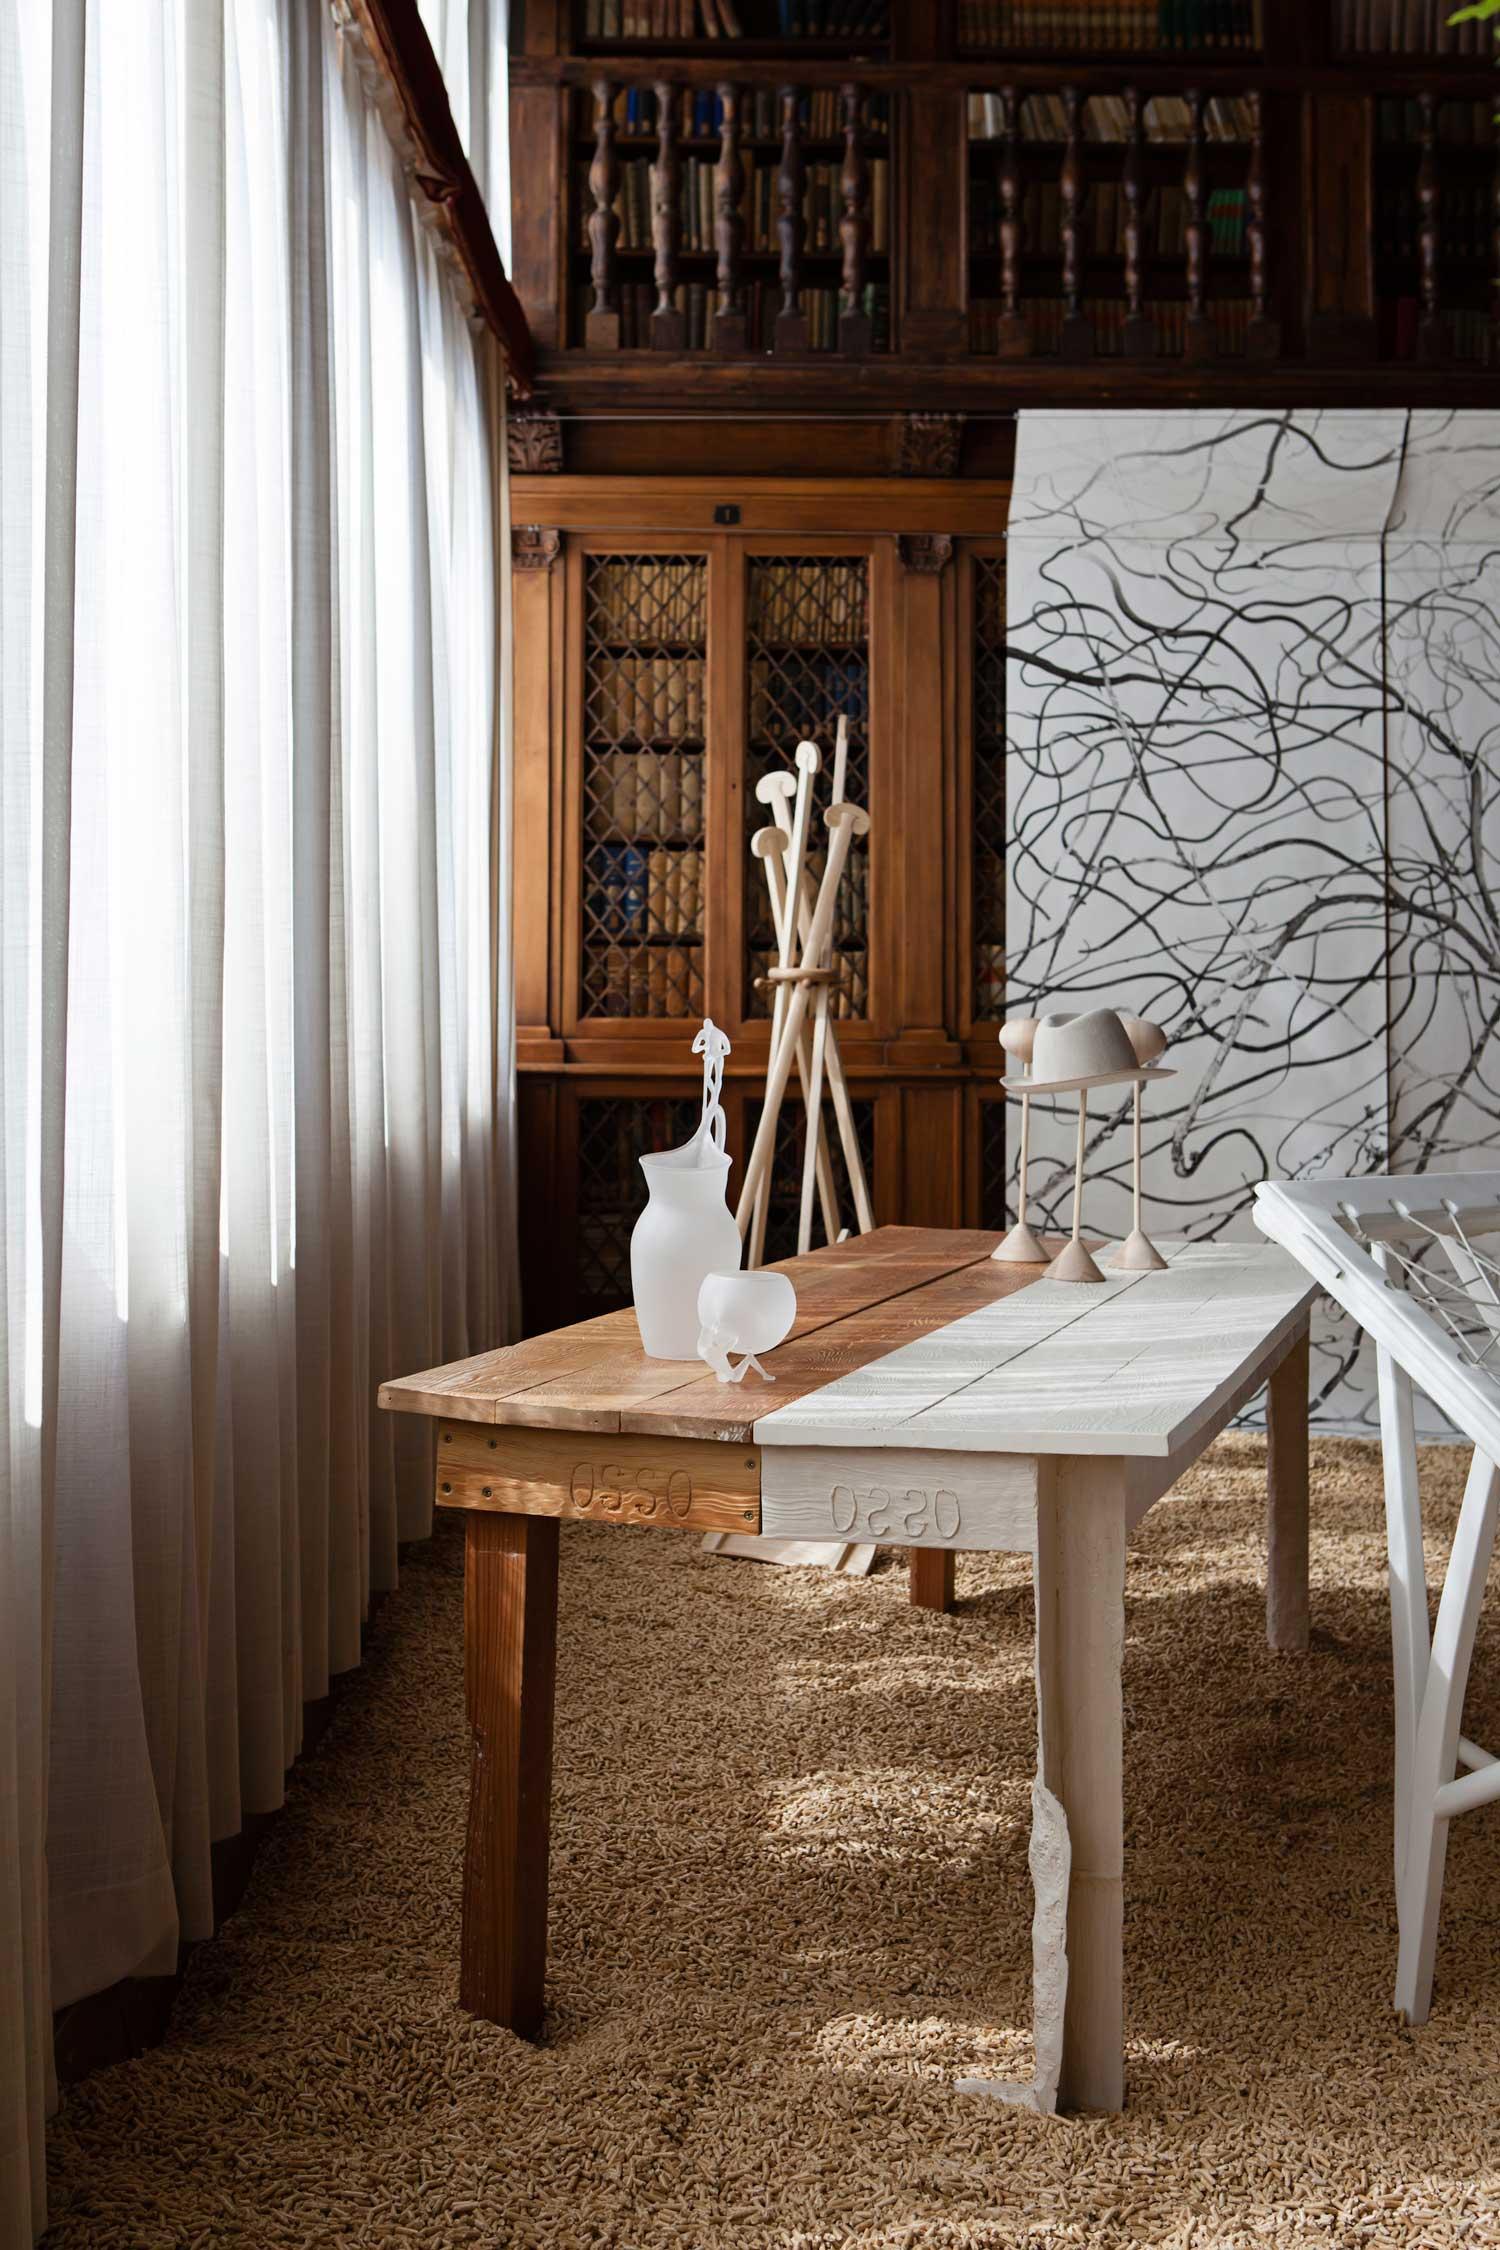 Design Ve Design Walks Through Venice Yellowtrace Bloglovin  # Meuble Tv Murale Meuble Tv Murale Design Ronna Mobilo Design